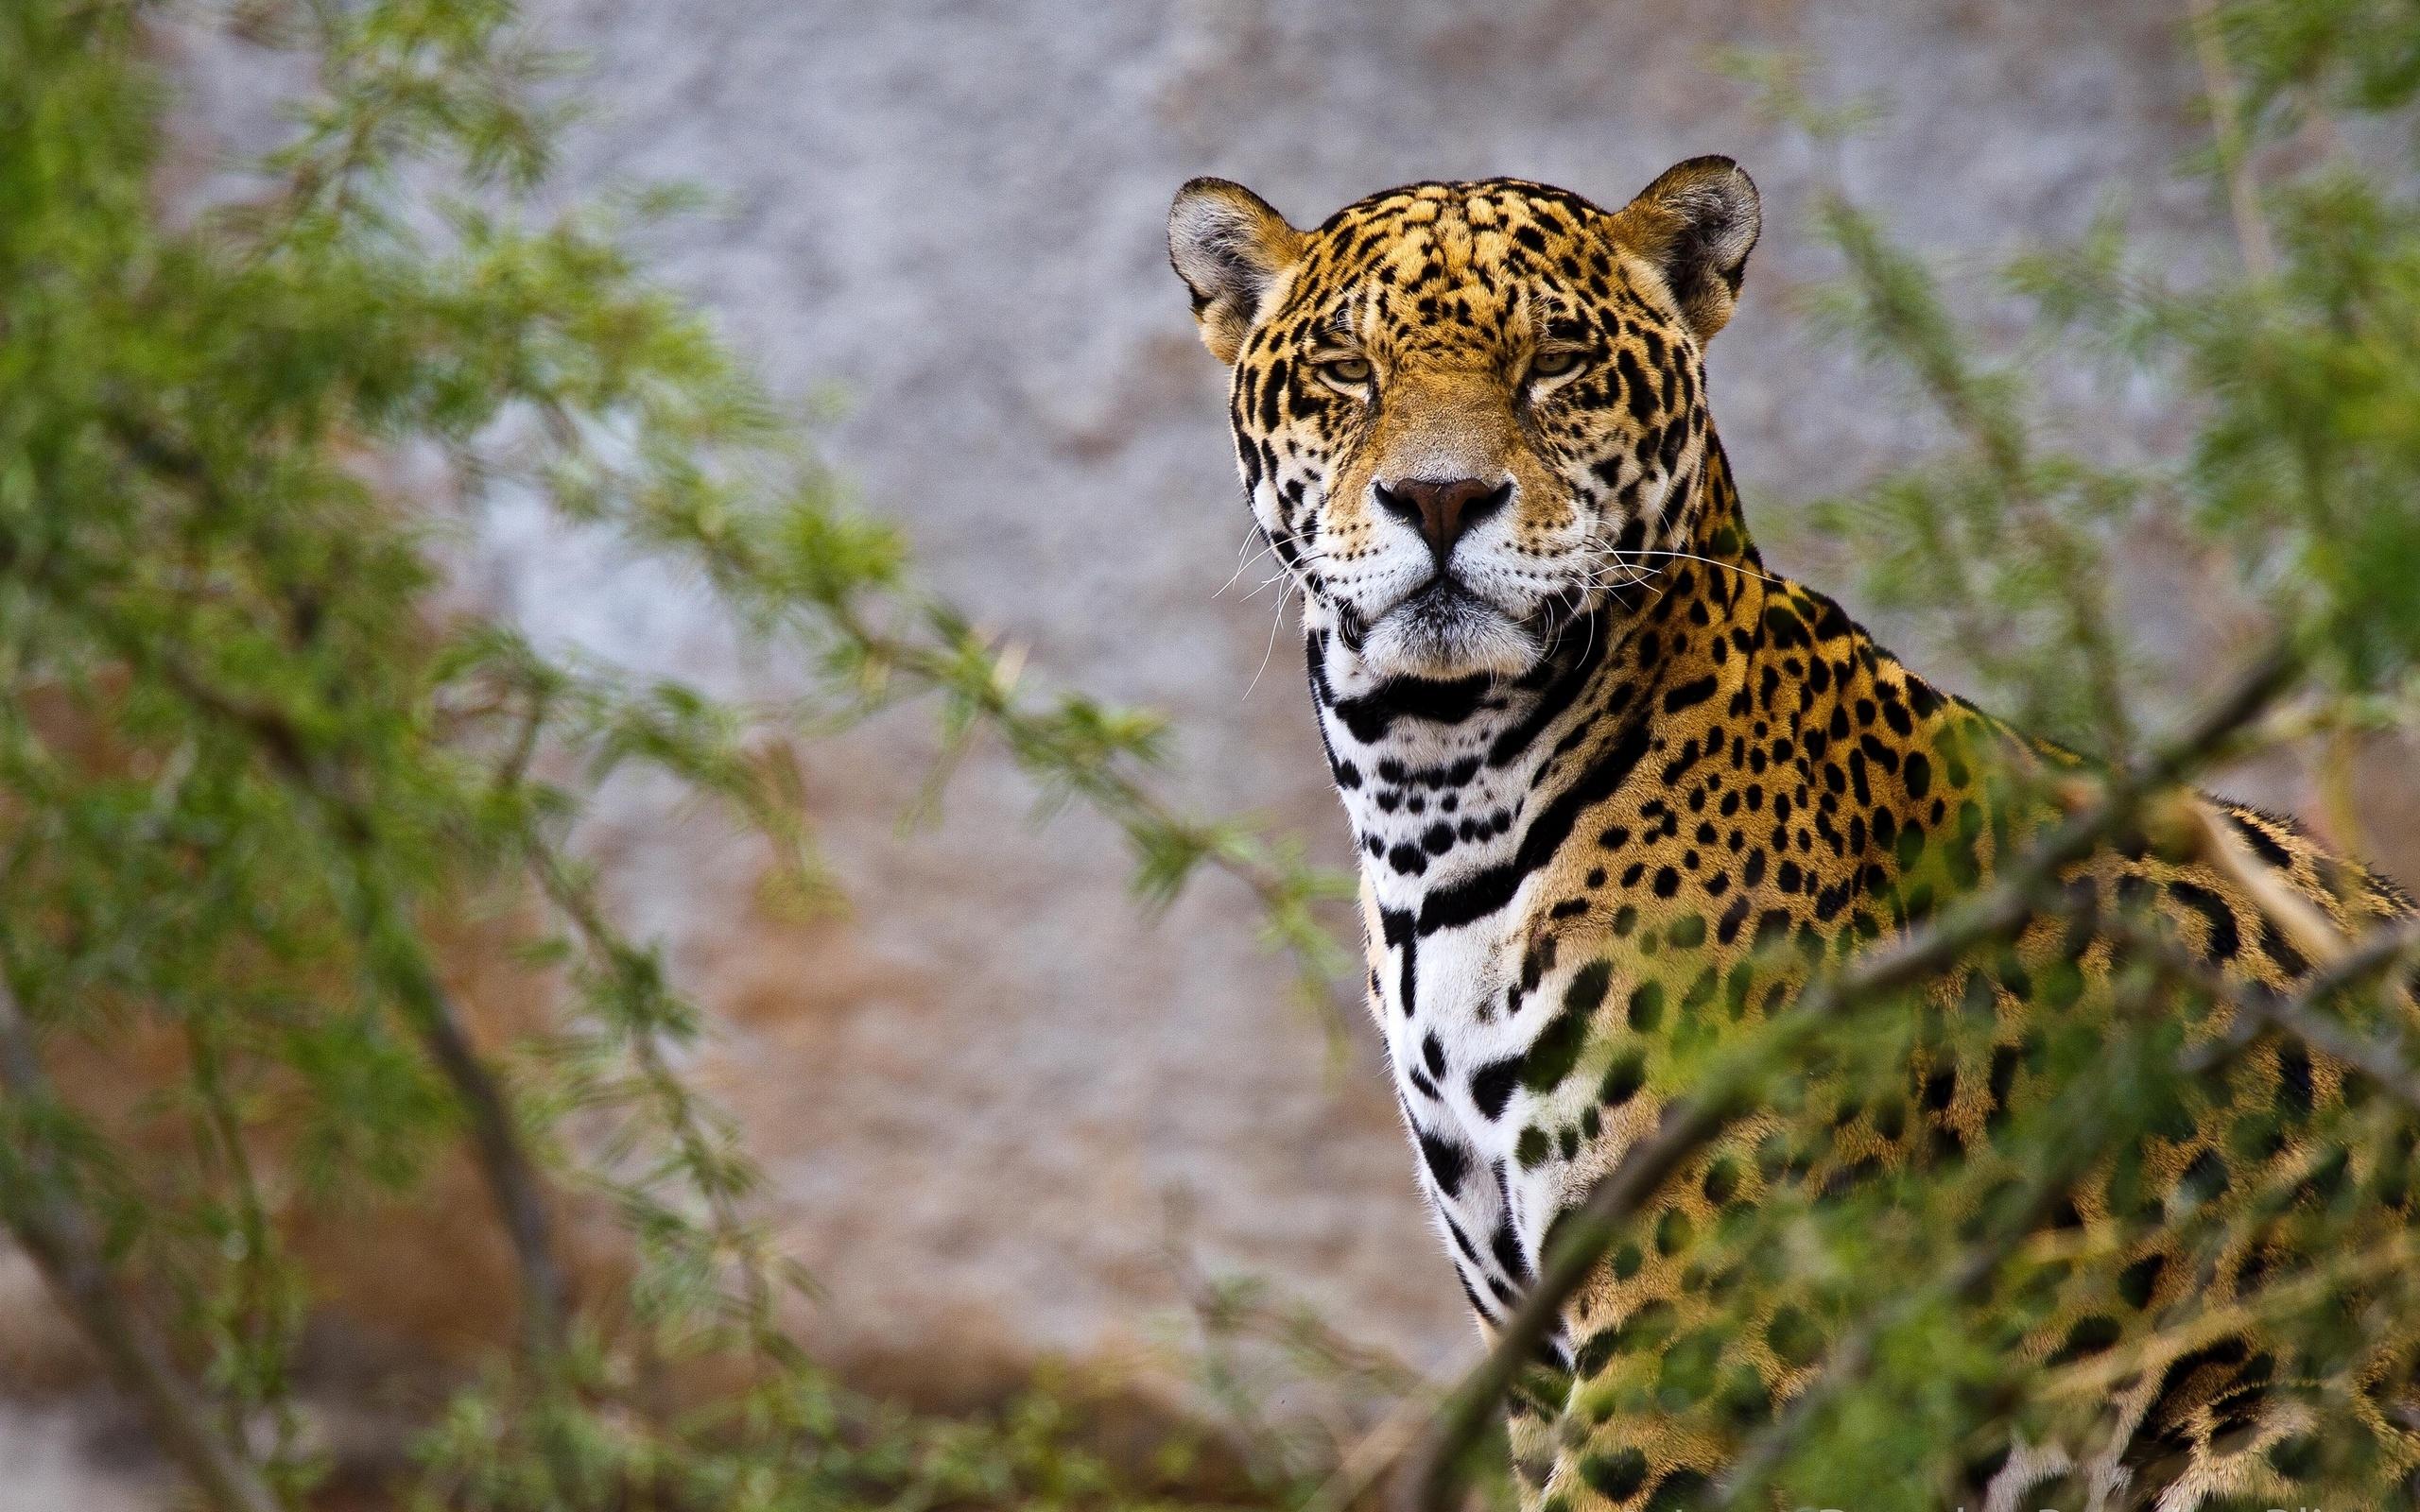 Tiger Live Wallpaper Iphone X Jaguar Full Hd Wallpaper And Background Image 2560x1600